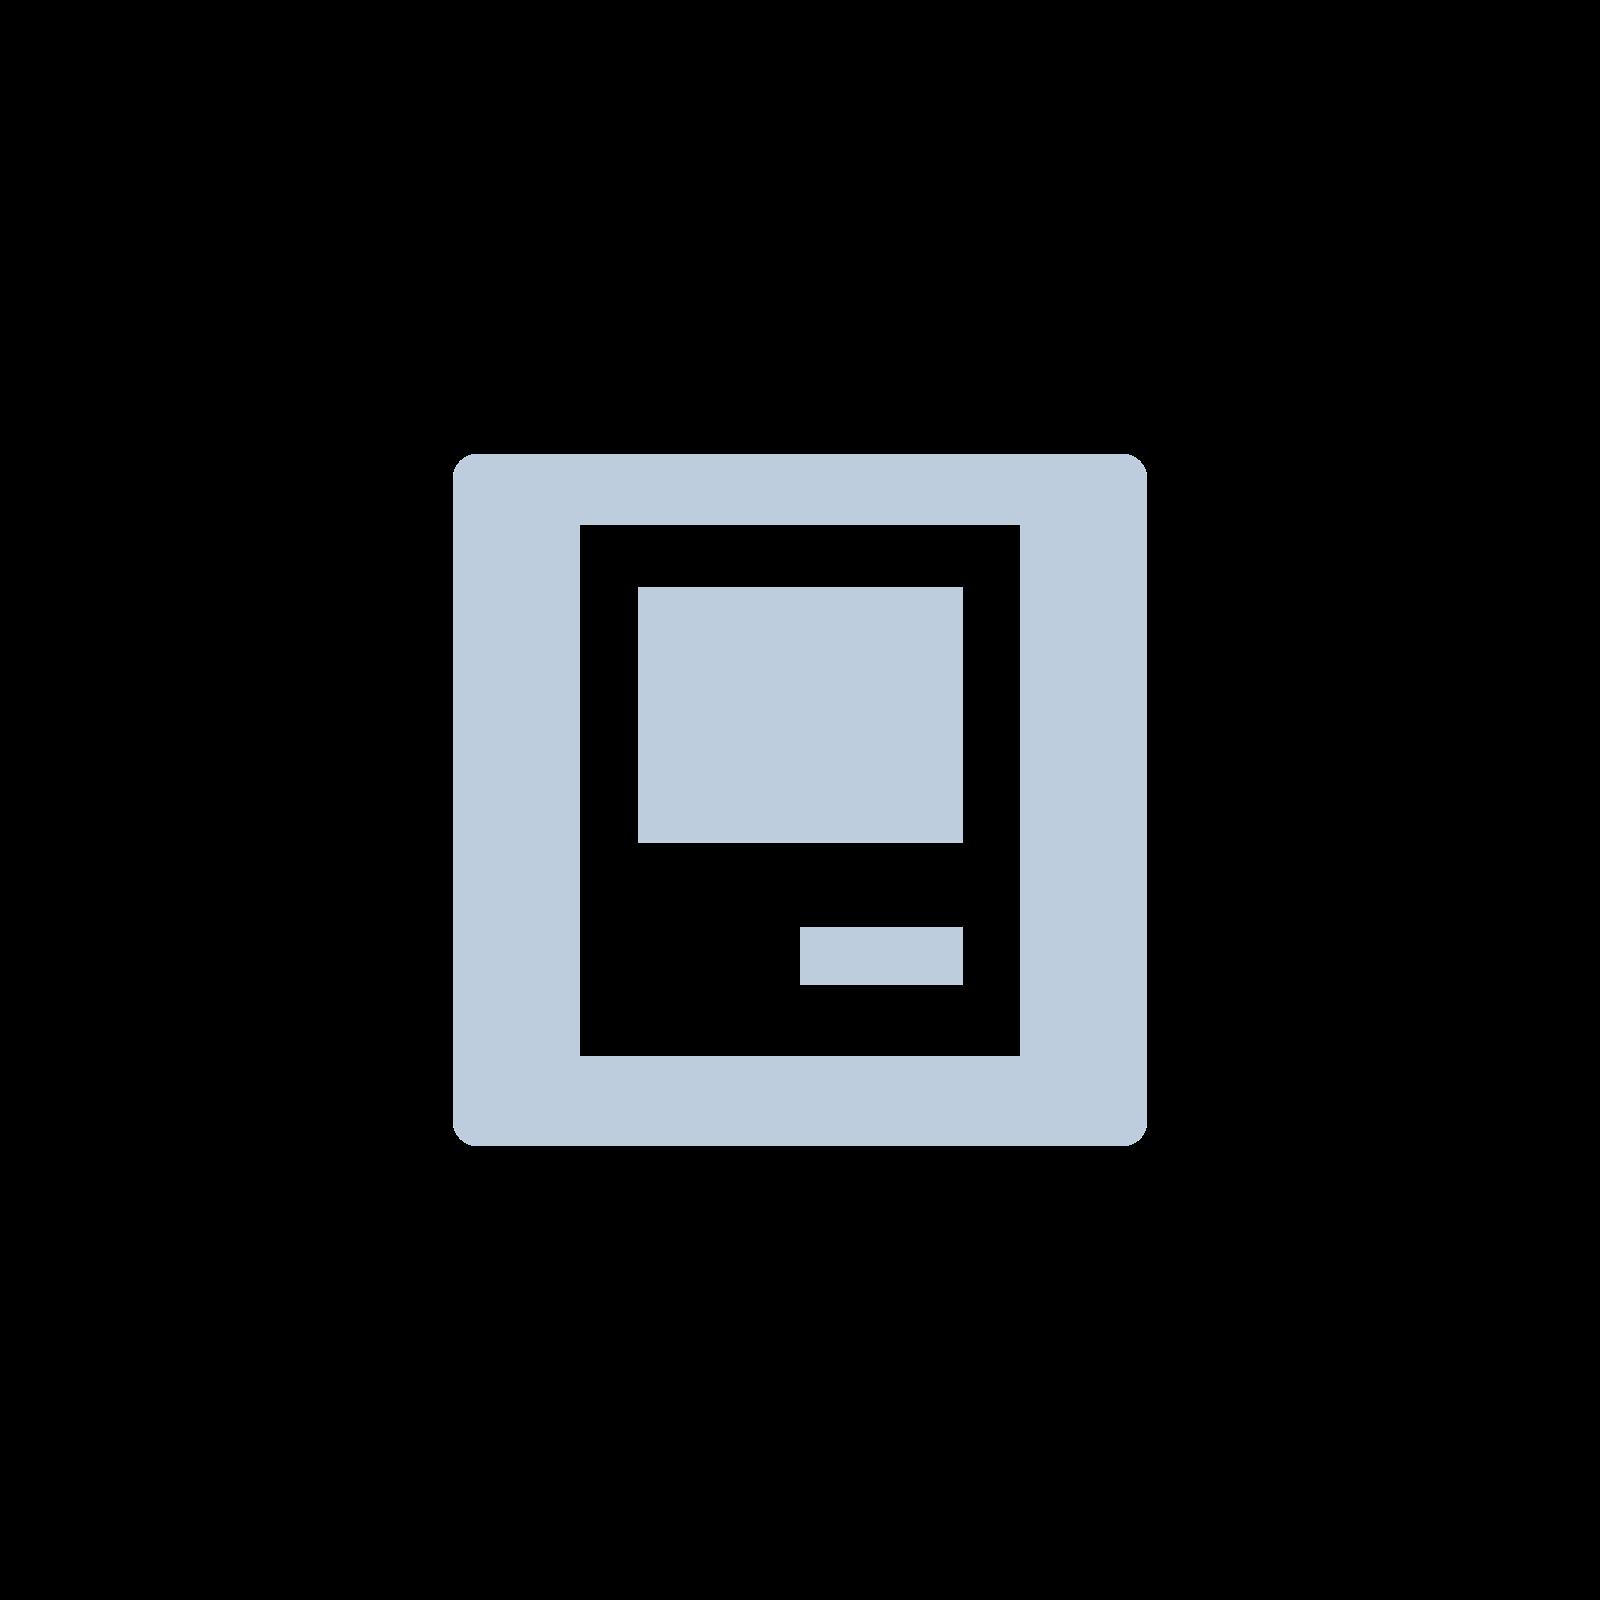 Mac mini Core 2 Duo 2,66 GHz (Macmini4,1, 500GB, 4GB)